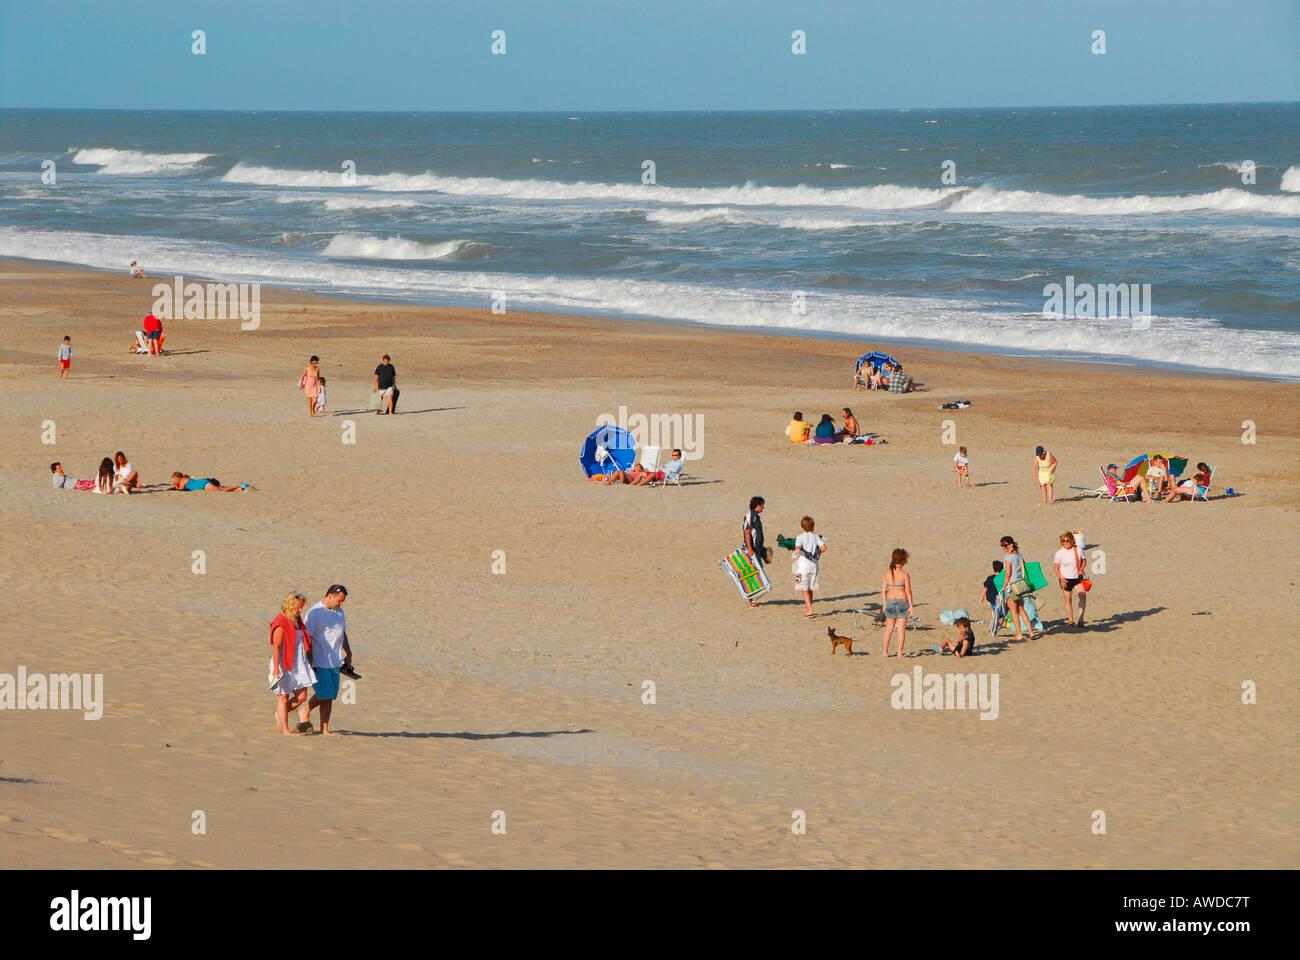 Beach of Mar de las Pampas, Buenos Aires province, Argentina - Stock Image